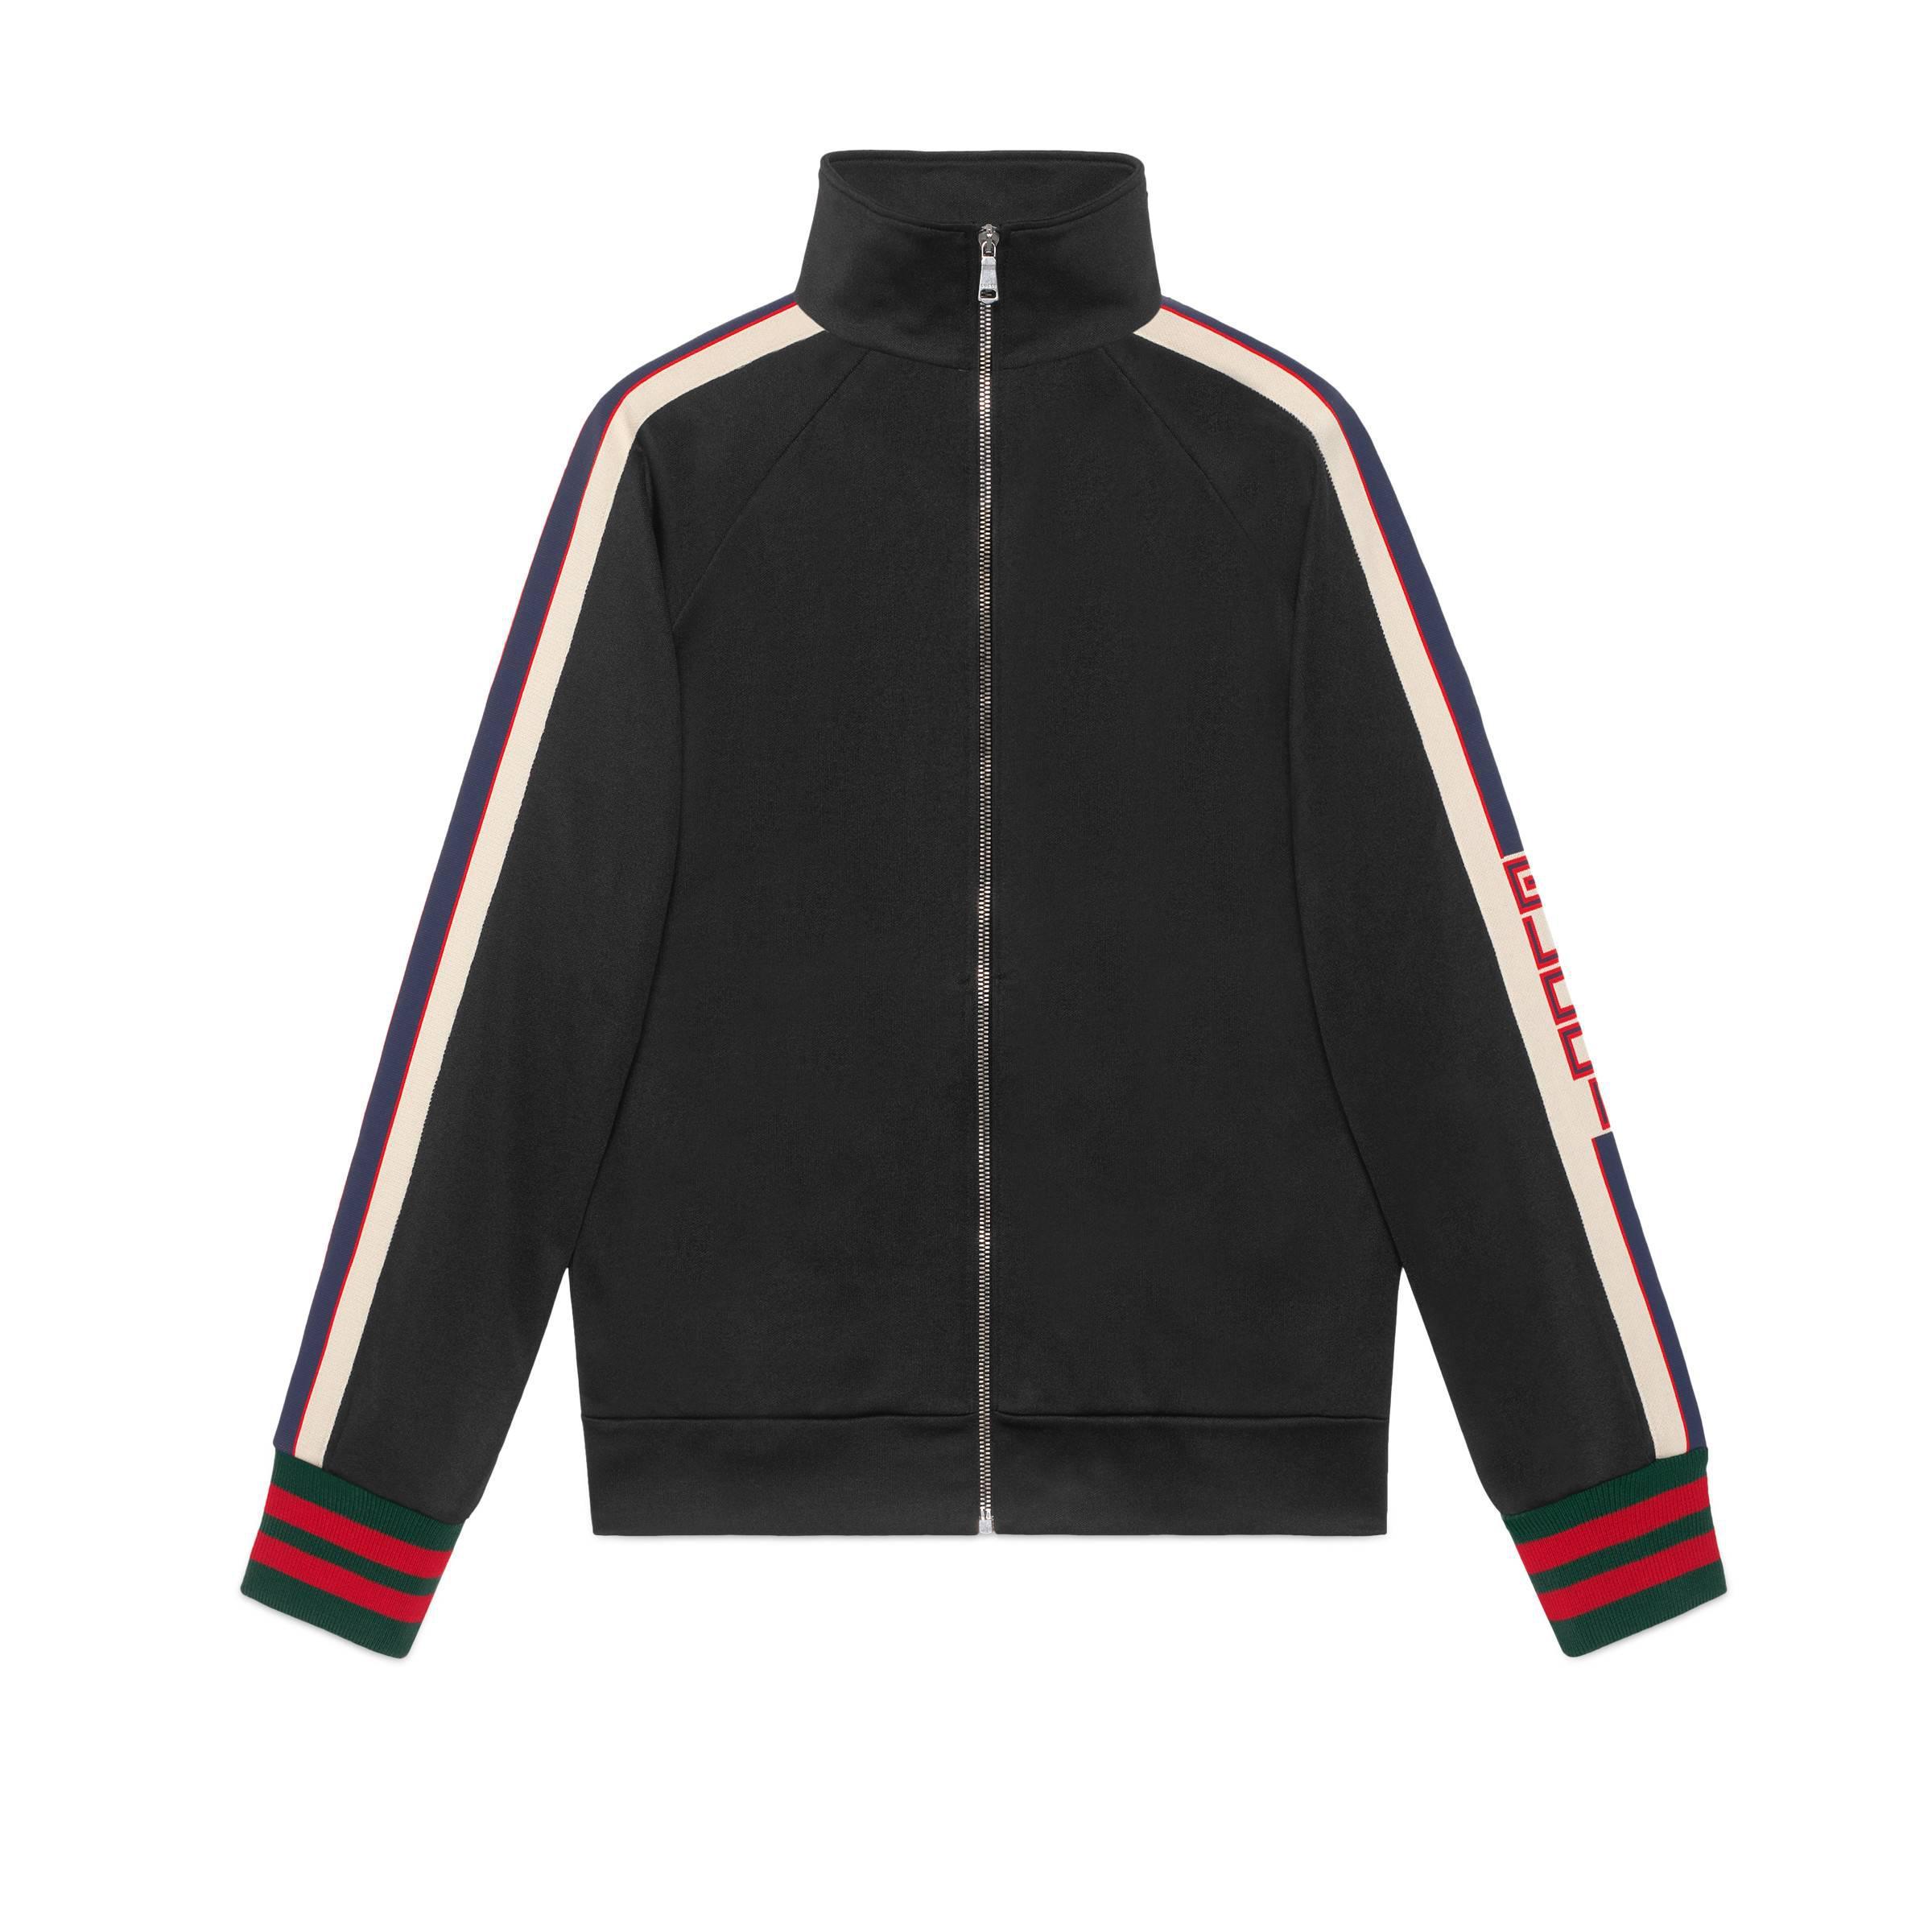 f1162e577 Gucci - Black Technical Jersey Jacket for Men - Lyst. View fullscreen